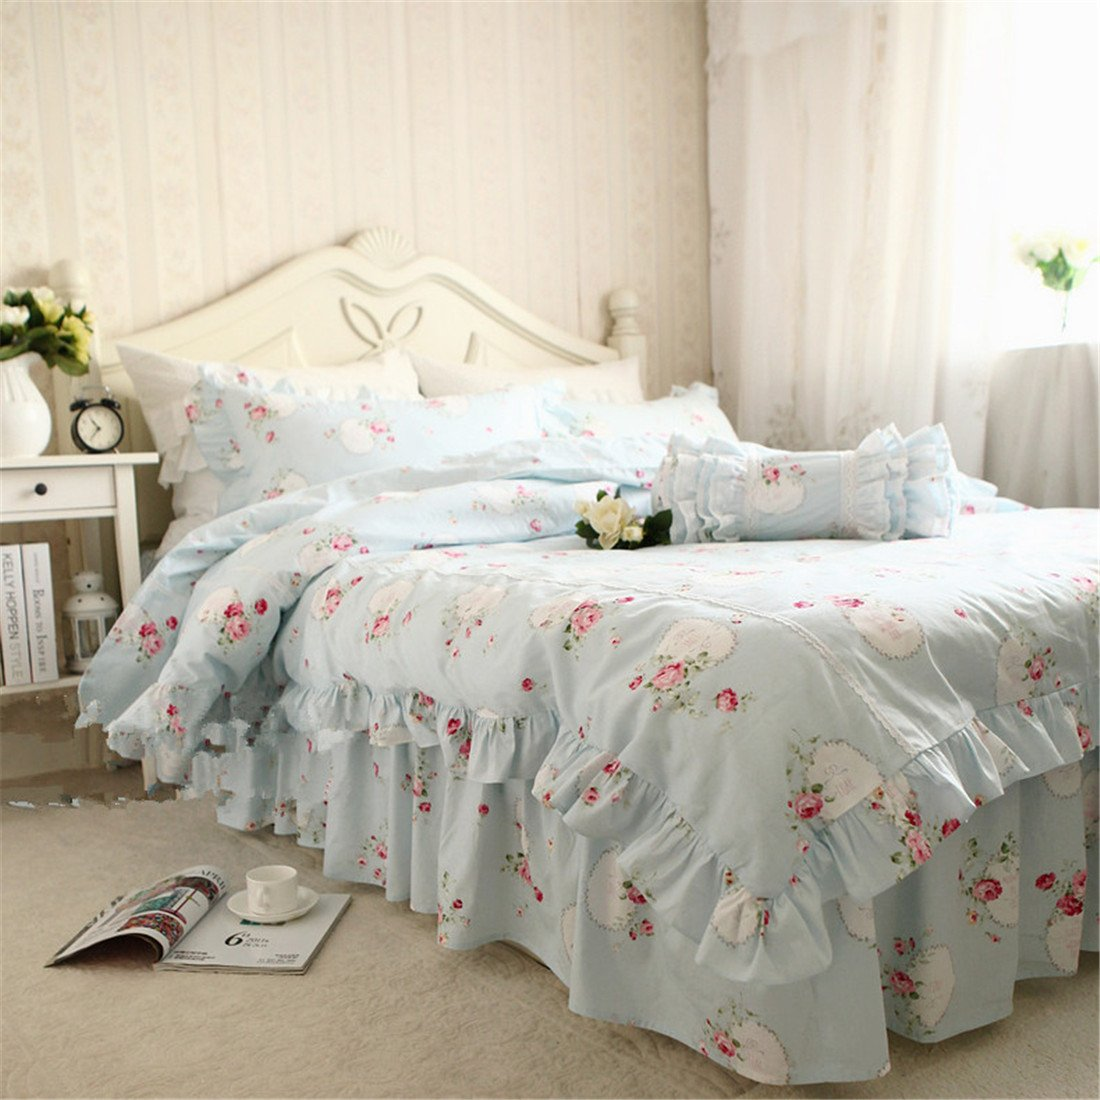 Lotus Karen 100%Cotton Blue Pastoral Flowers 4PC Floral Bed Sheet Set Ruffles Korean Bedding Set With Romantic Love Letters Patterns For Wedding Bedding King,1Duvet Cover,1Bedskirt,2Pillowcases by Lotus Karen (Image #3)